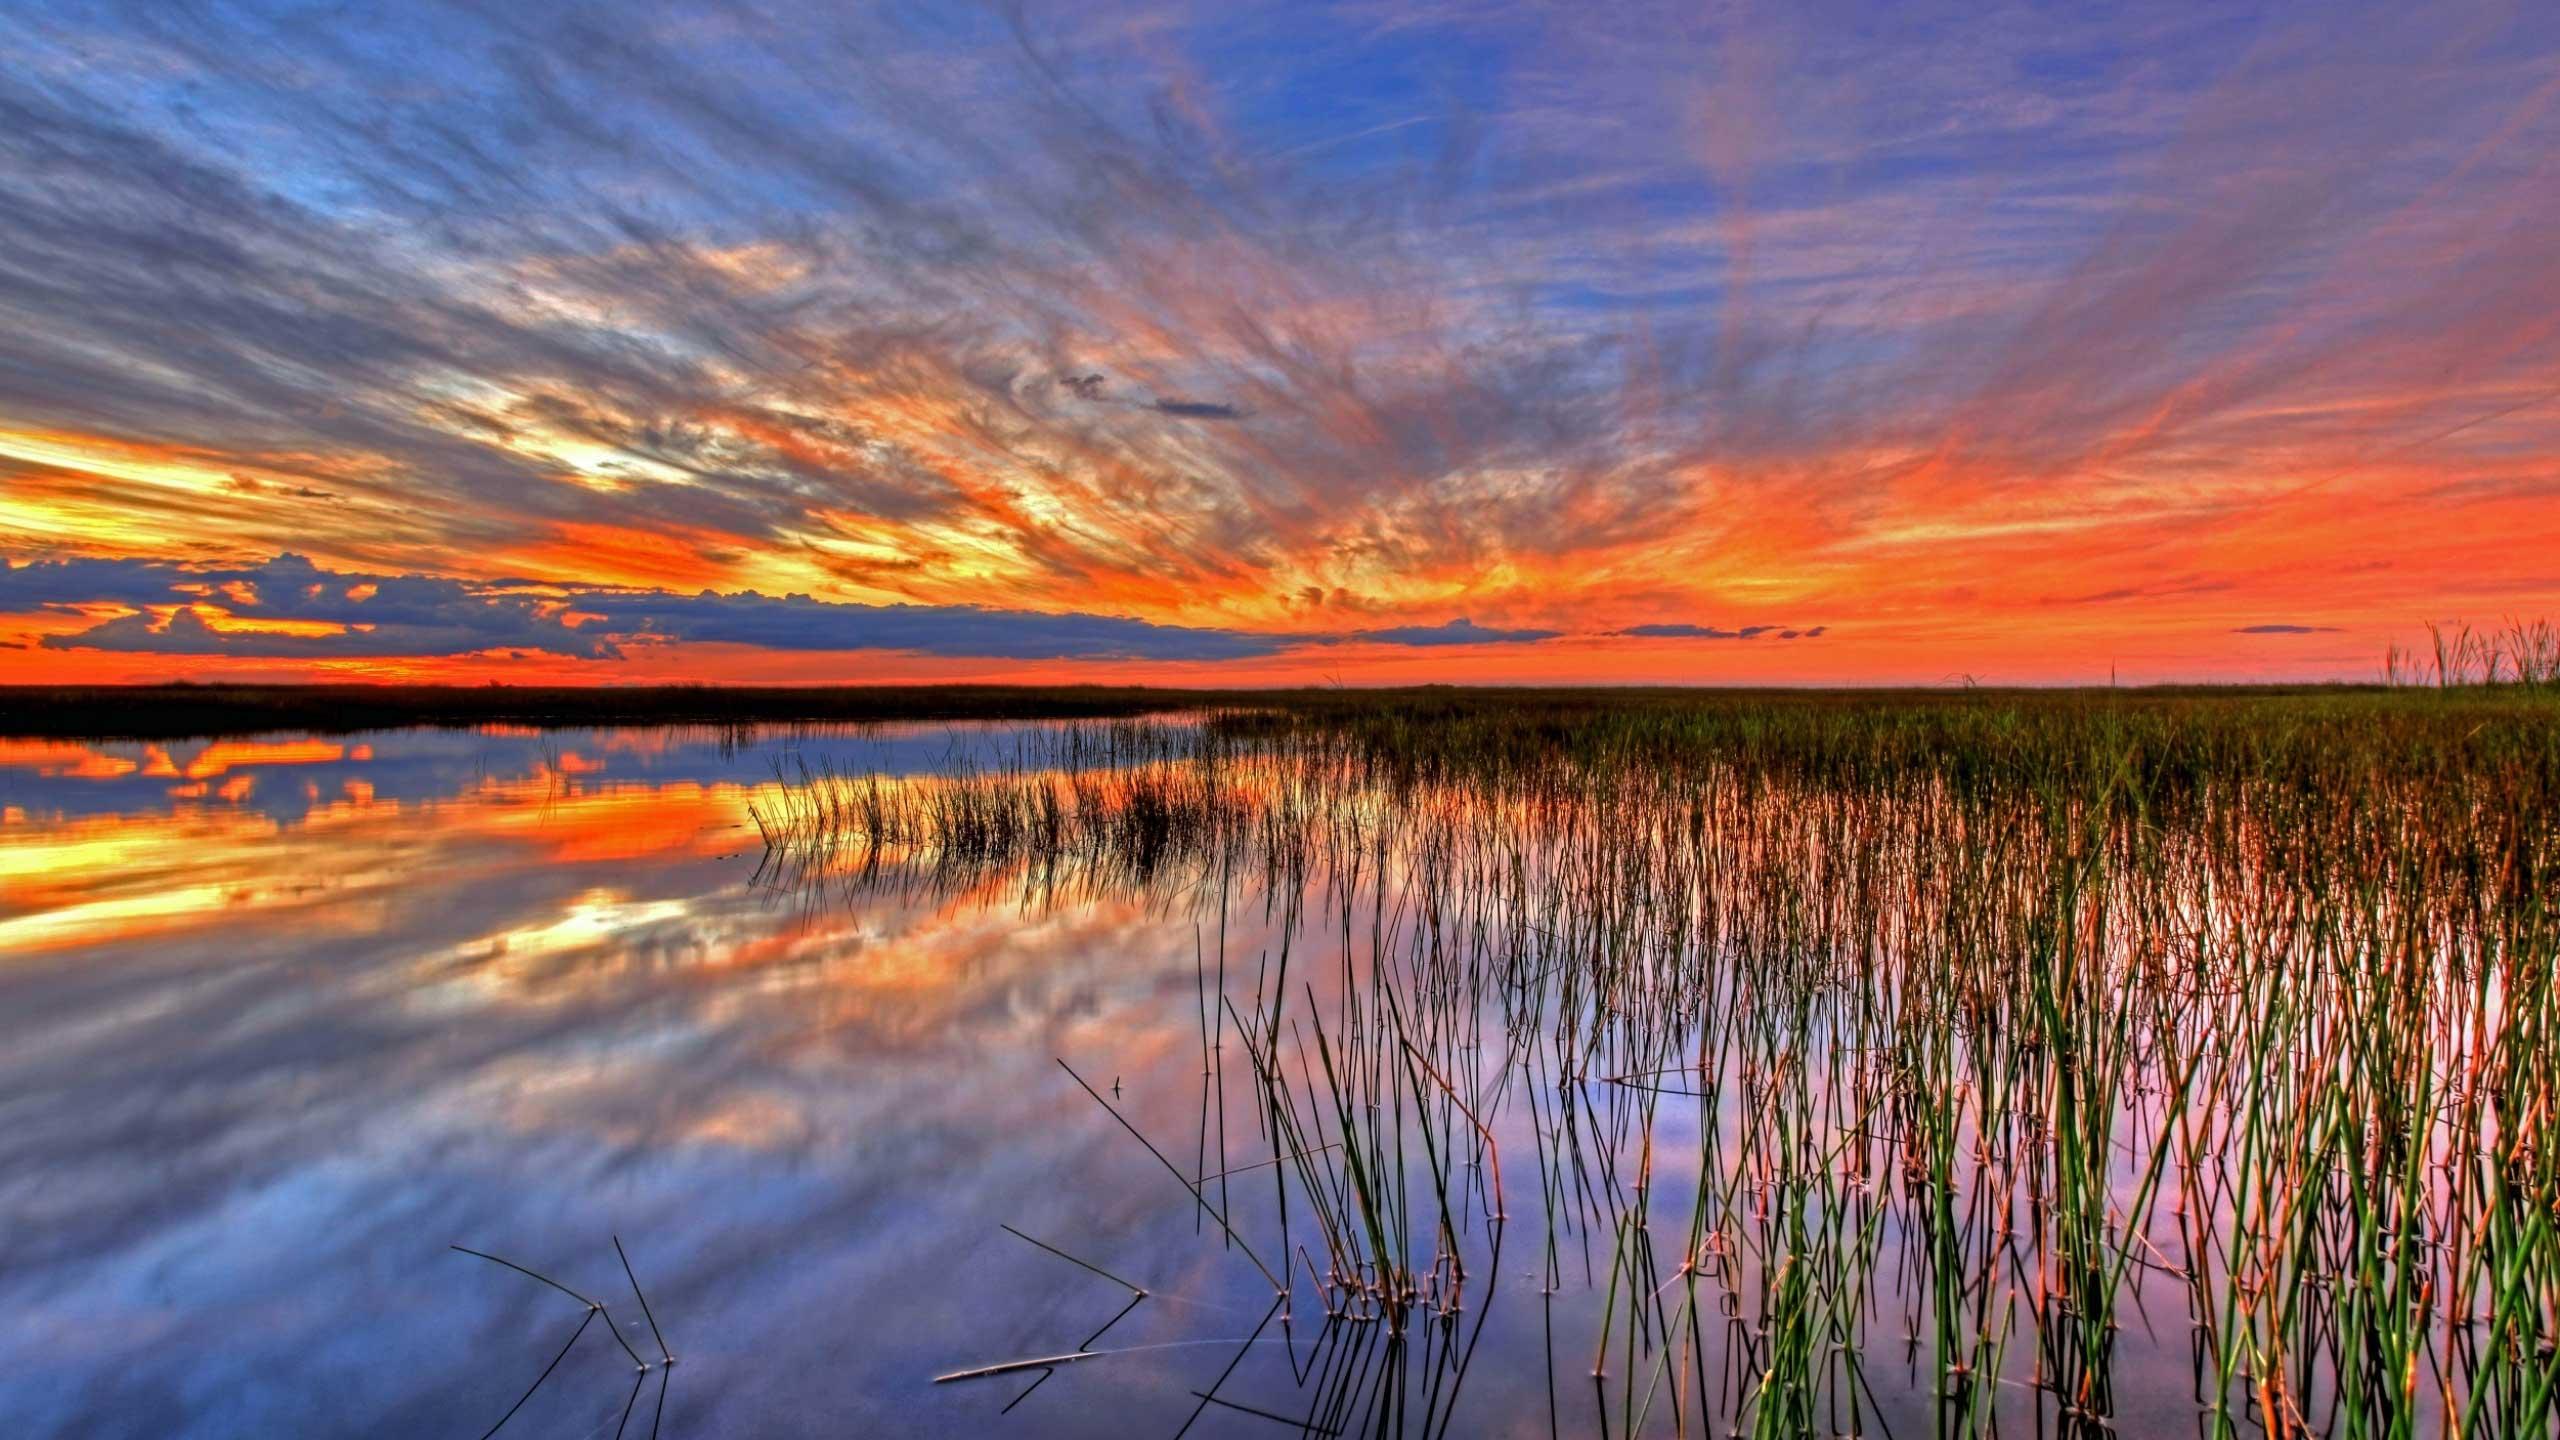 web_everglades_swamp_florida_106286_2560x1440